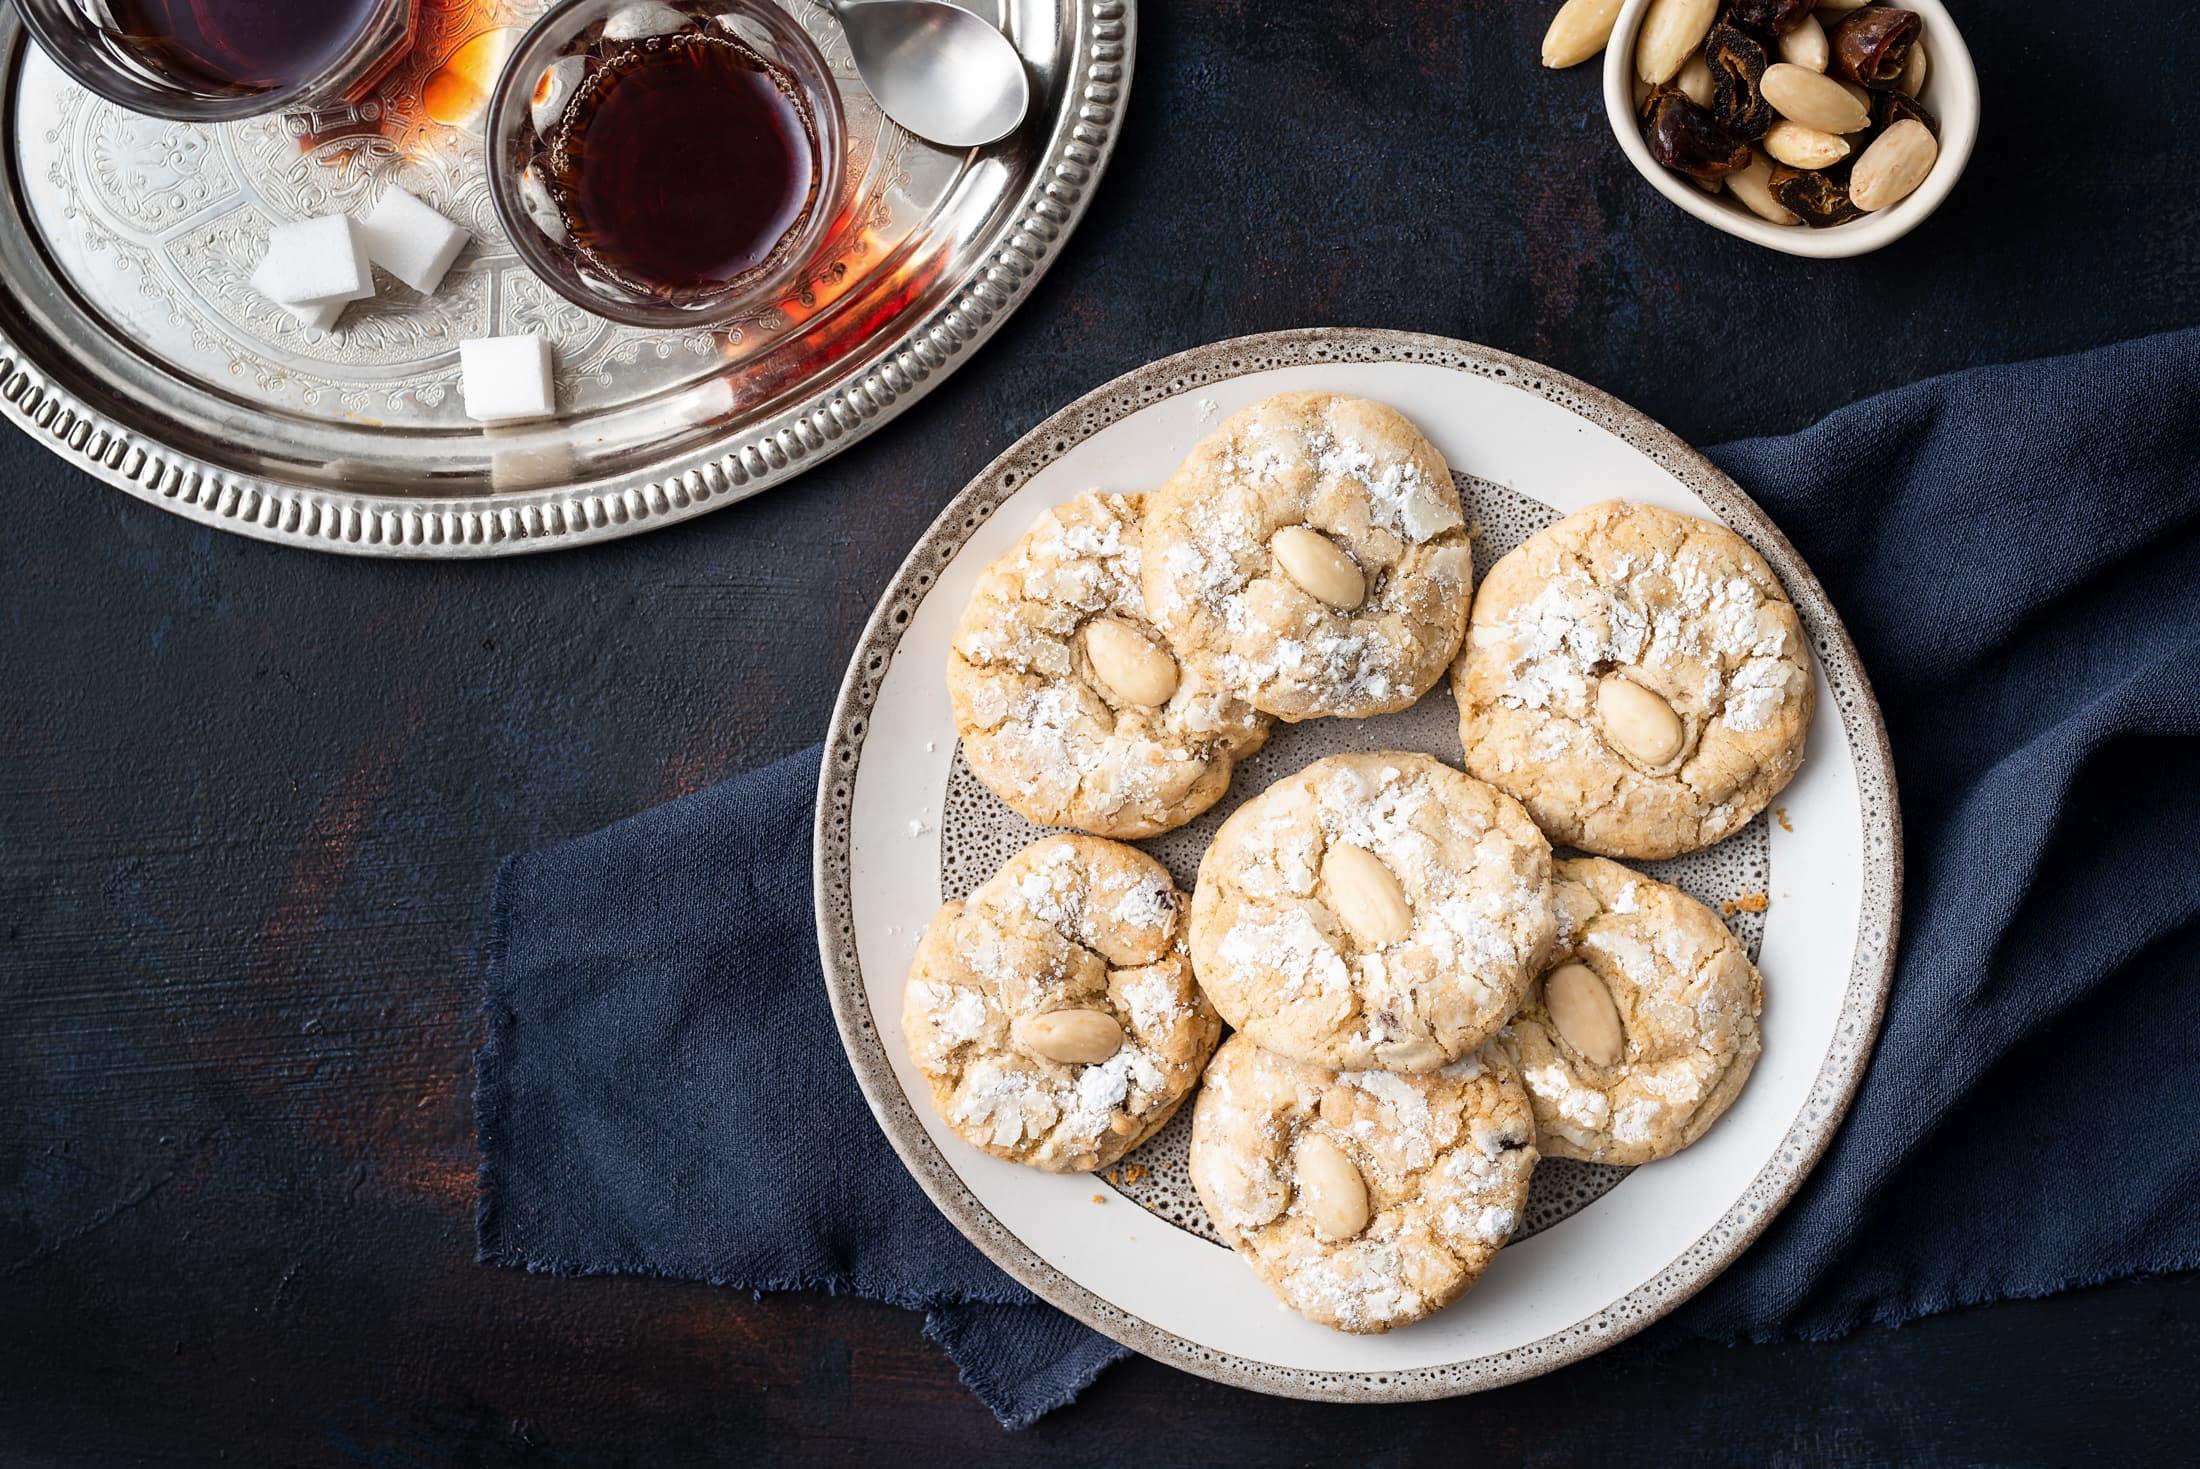 biscuits maroc